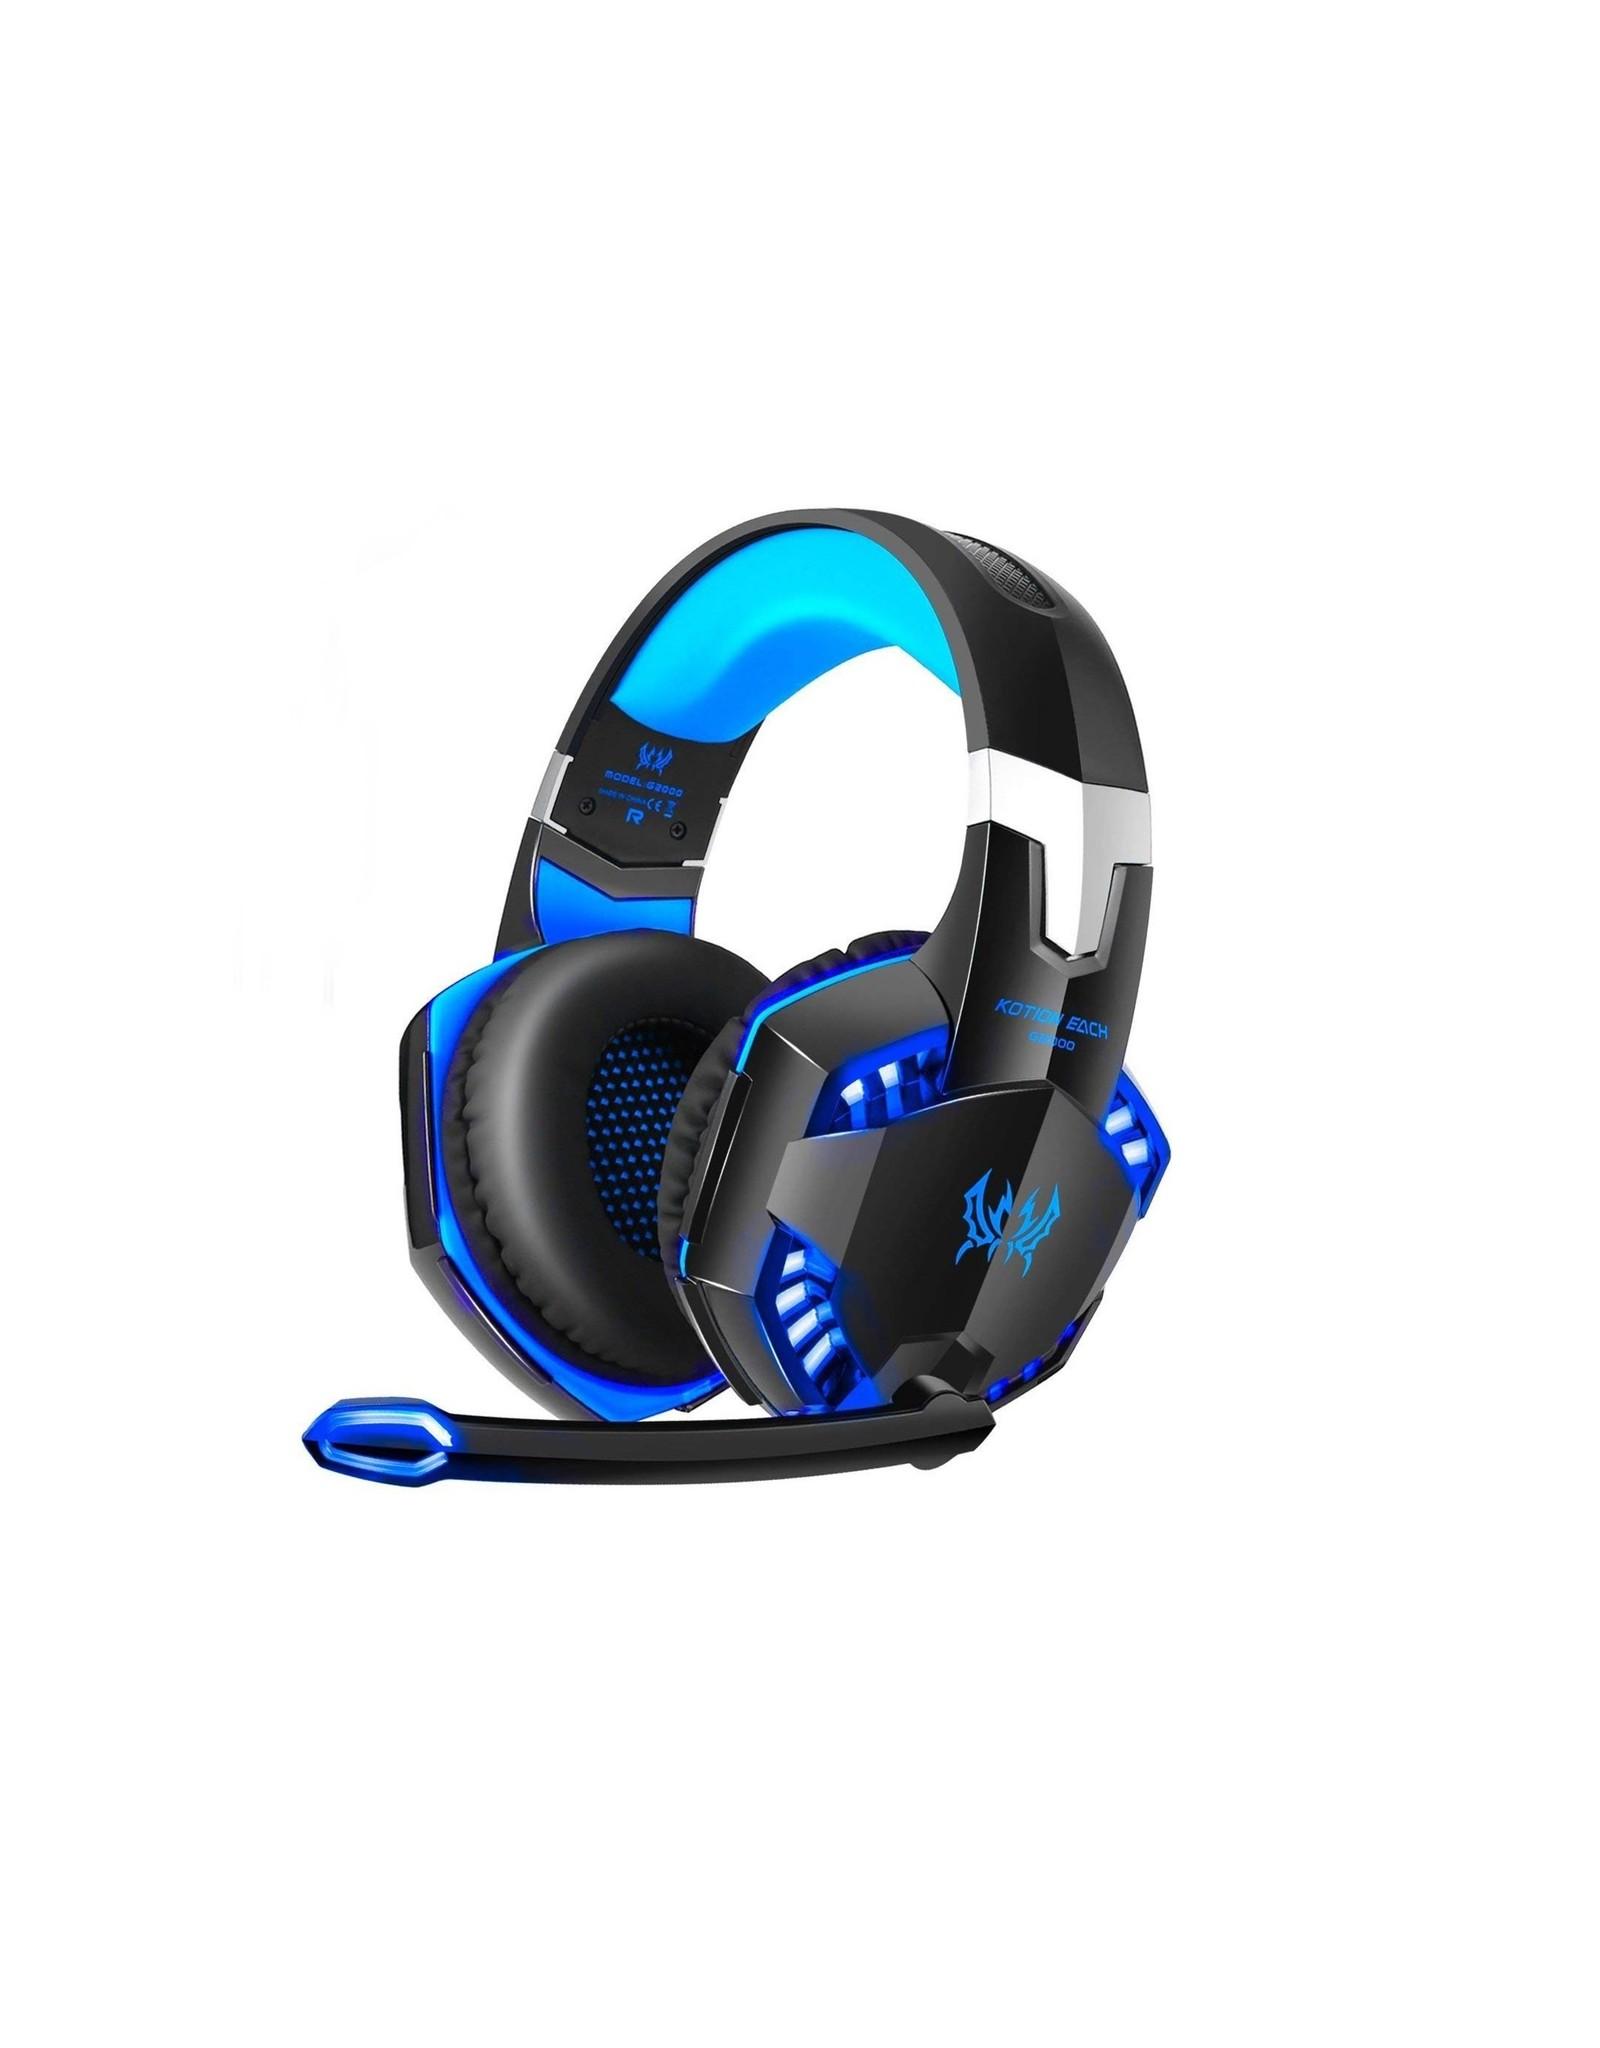 Parya Official Kotion Each G2000 - Gaming Headset - Black / Blue - EV